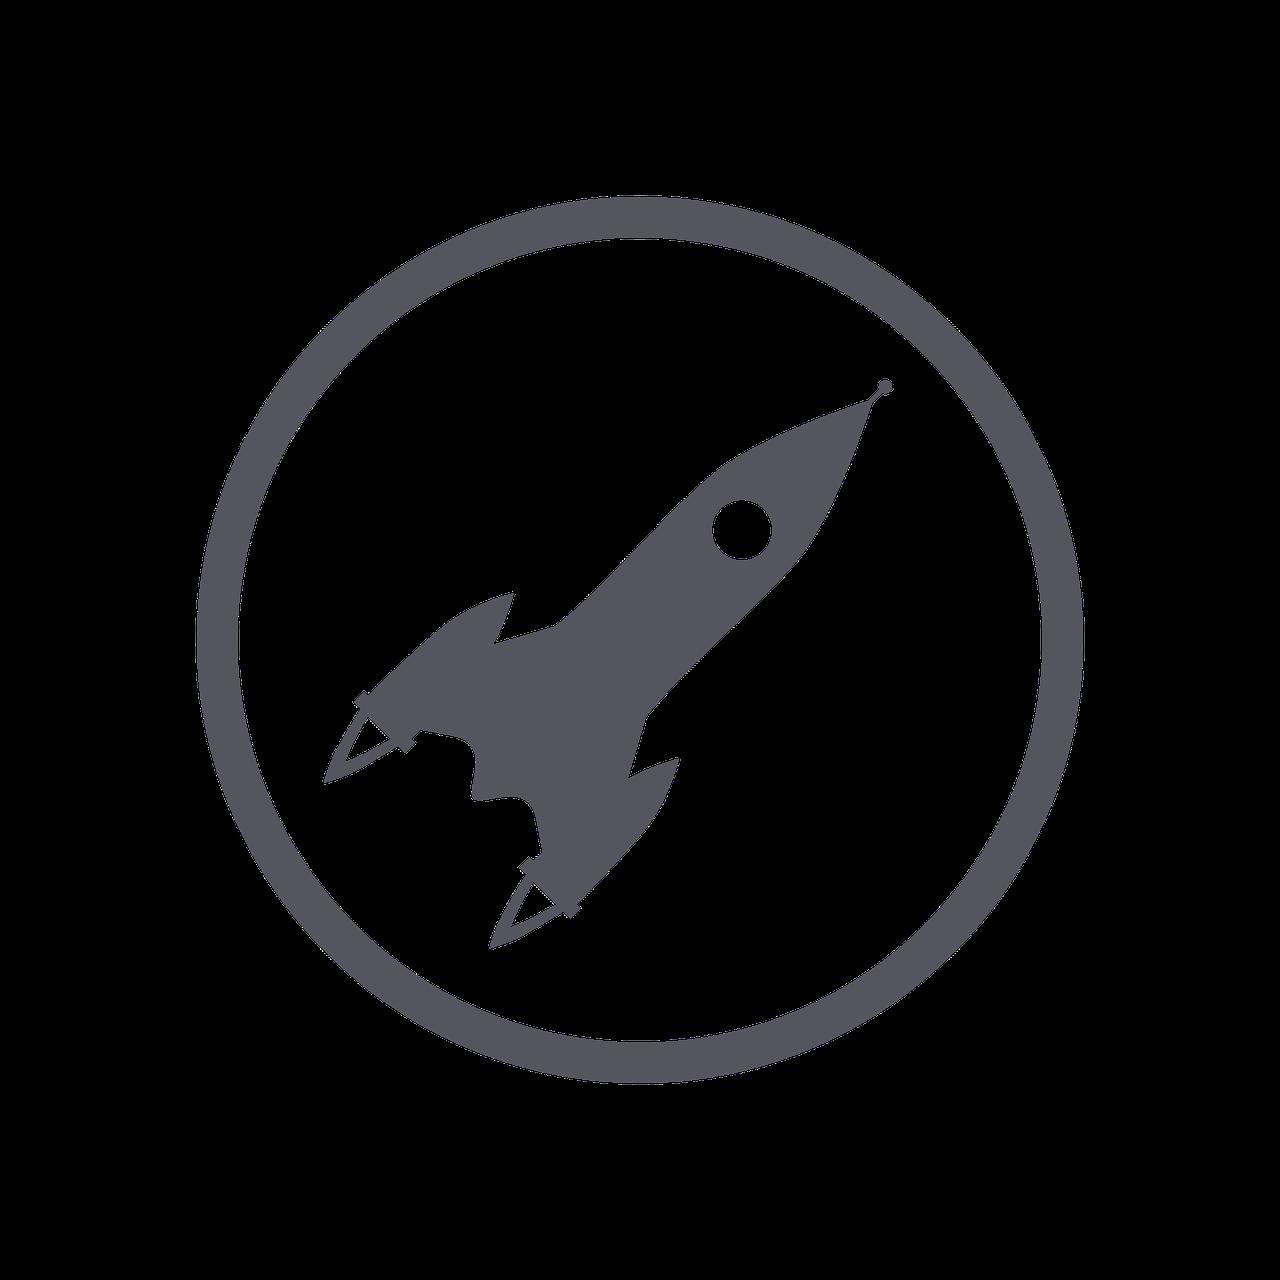 rocket-1976107_1280